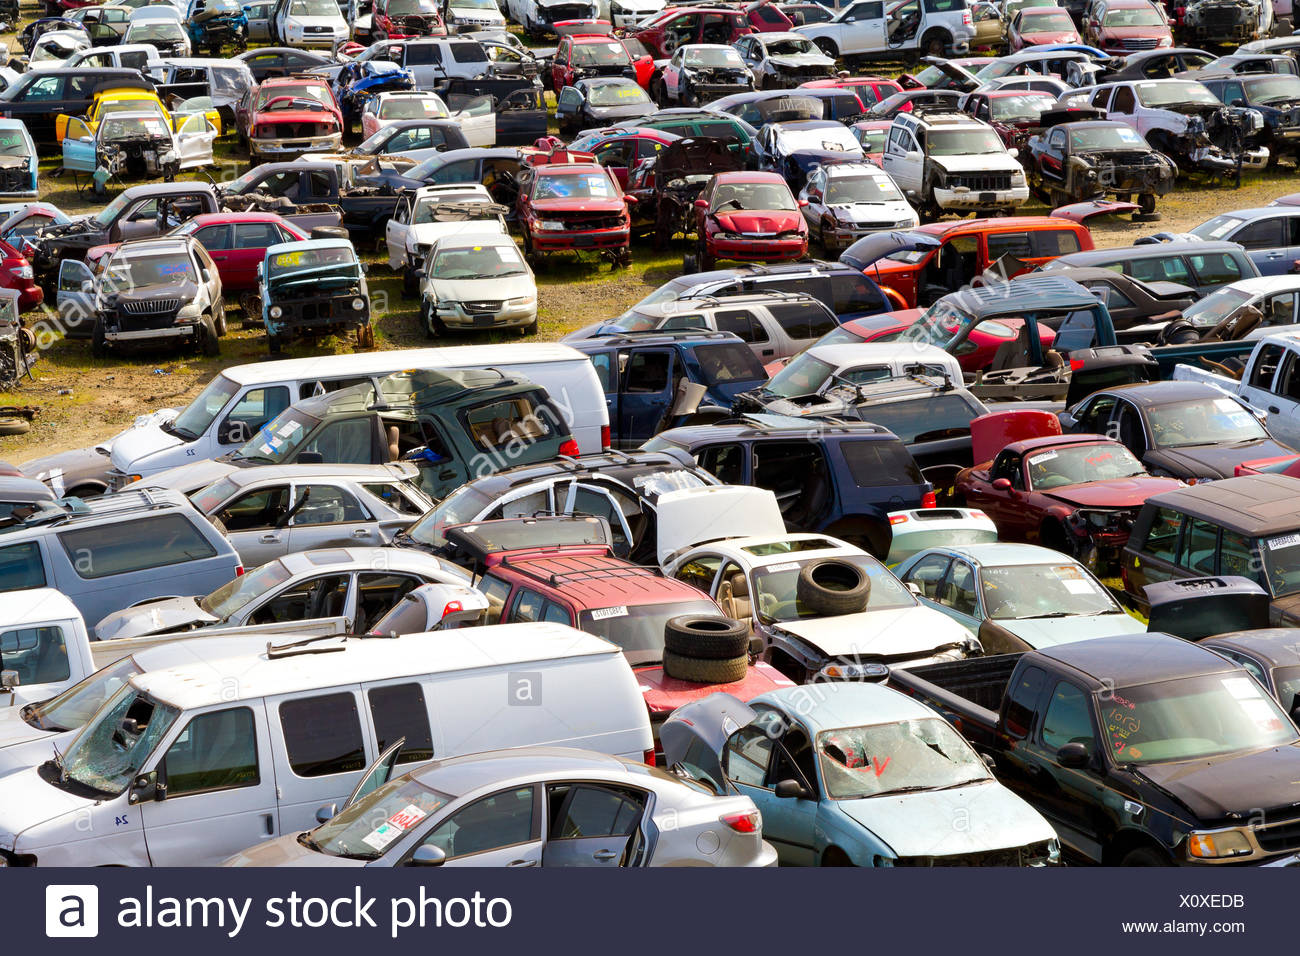 Auto Salvage Yard Junkyard Stock Photo: 275947991 - Alamy